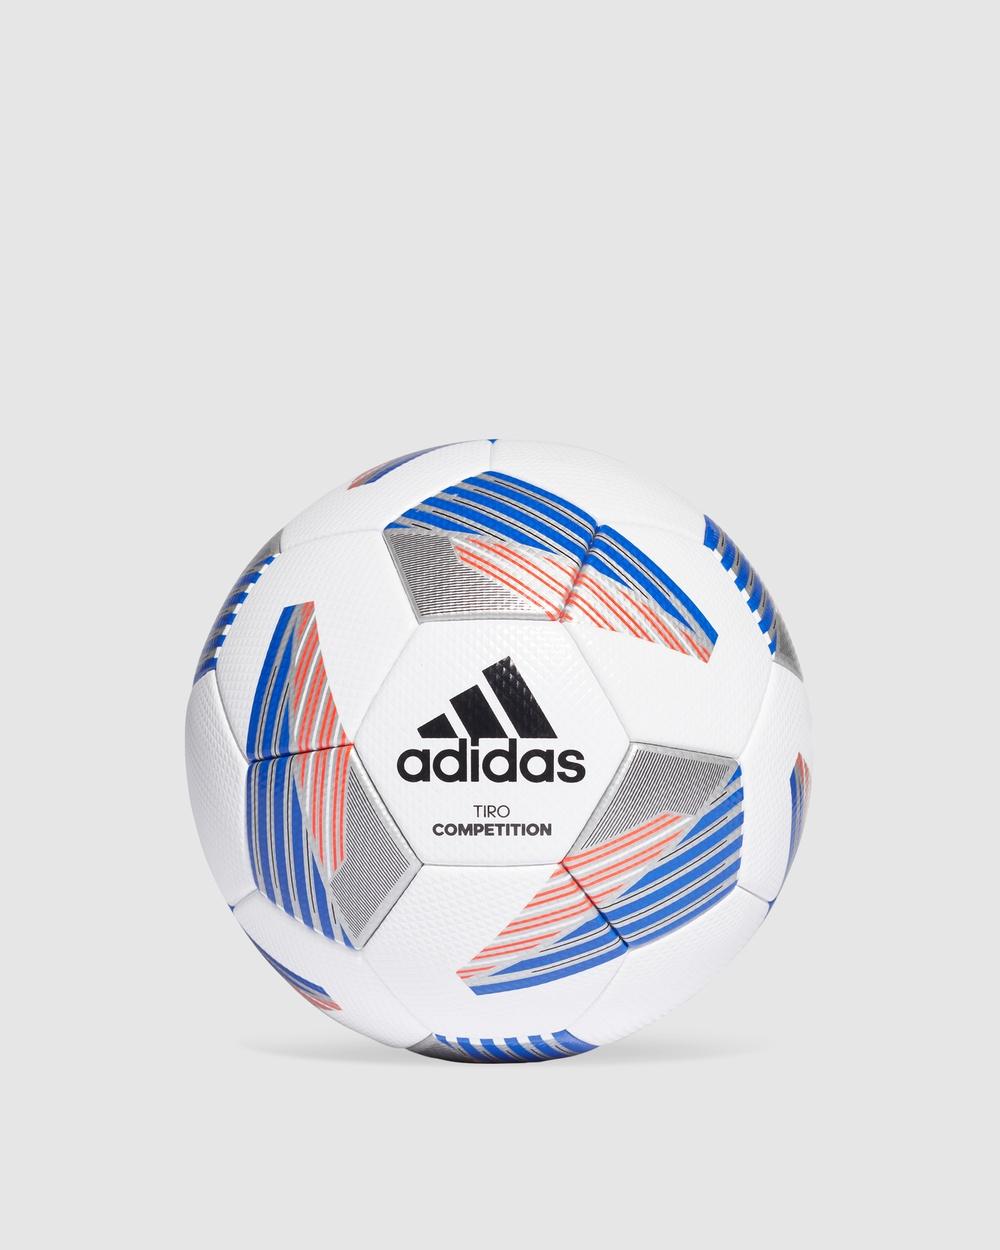 adidas Performance Tiro Competition Ball Sports Equipment White